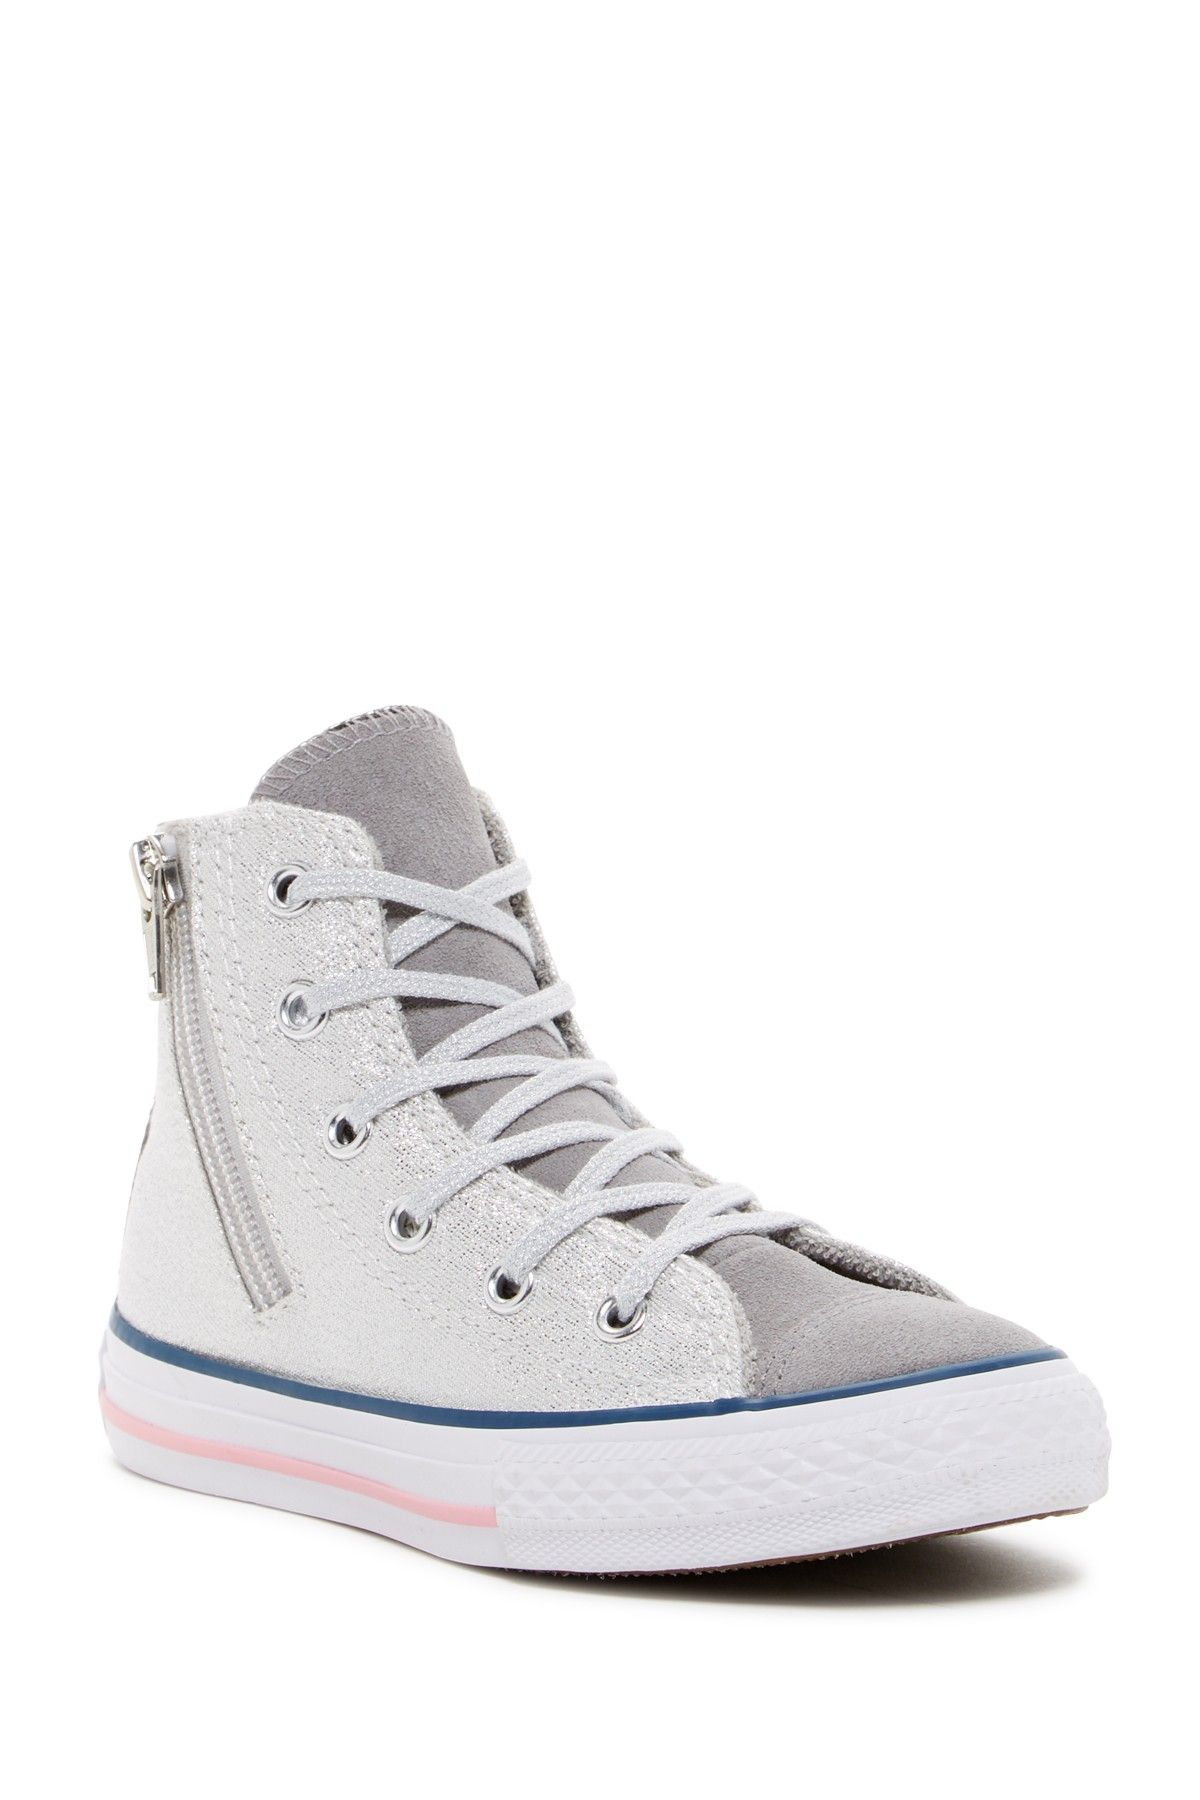 7adfc2e704aa Chuck Taylor® All Star® High Top Side Zip Metallic Sneaker (Little Kid    Big Kid)